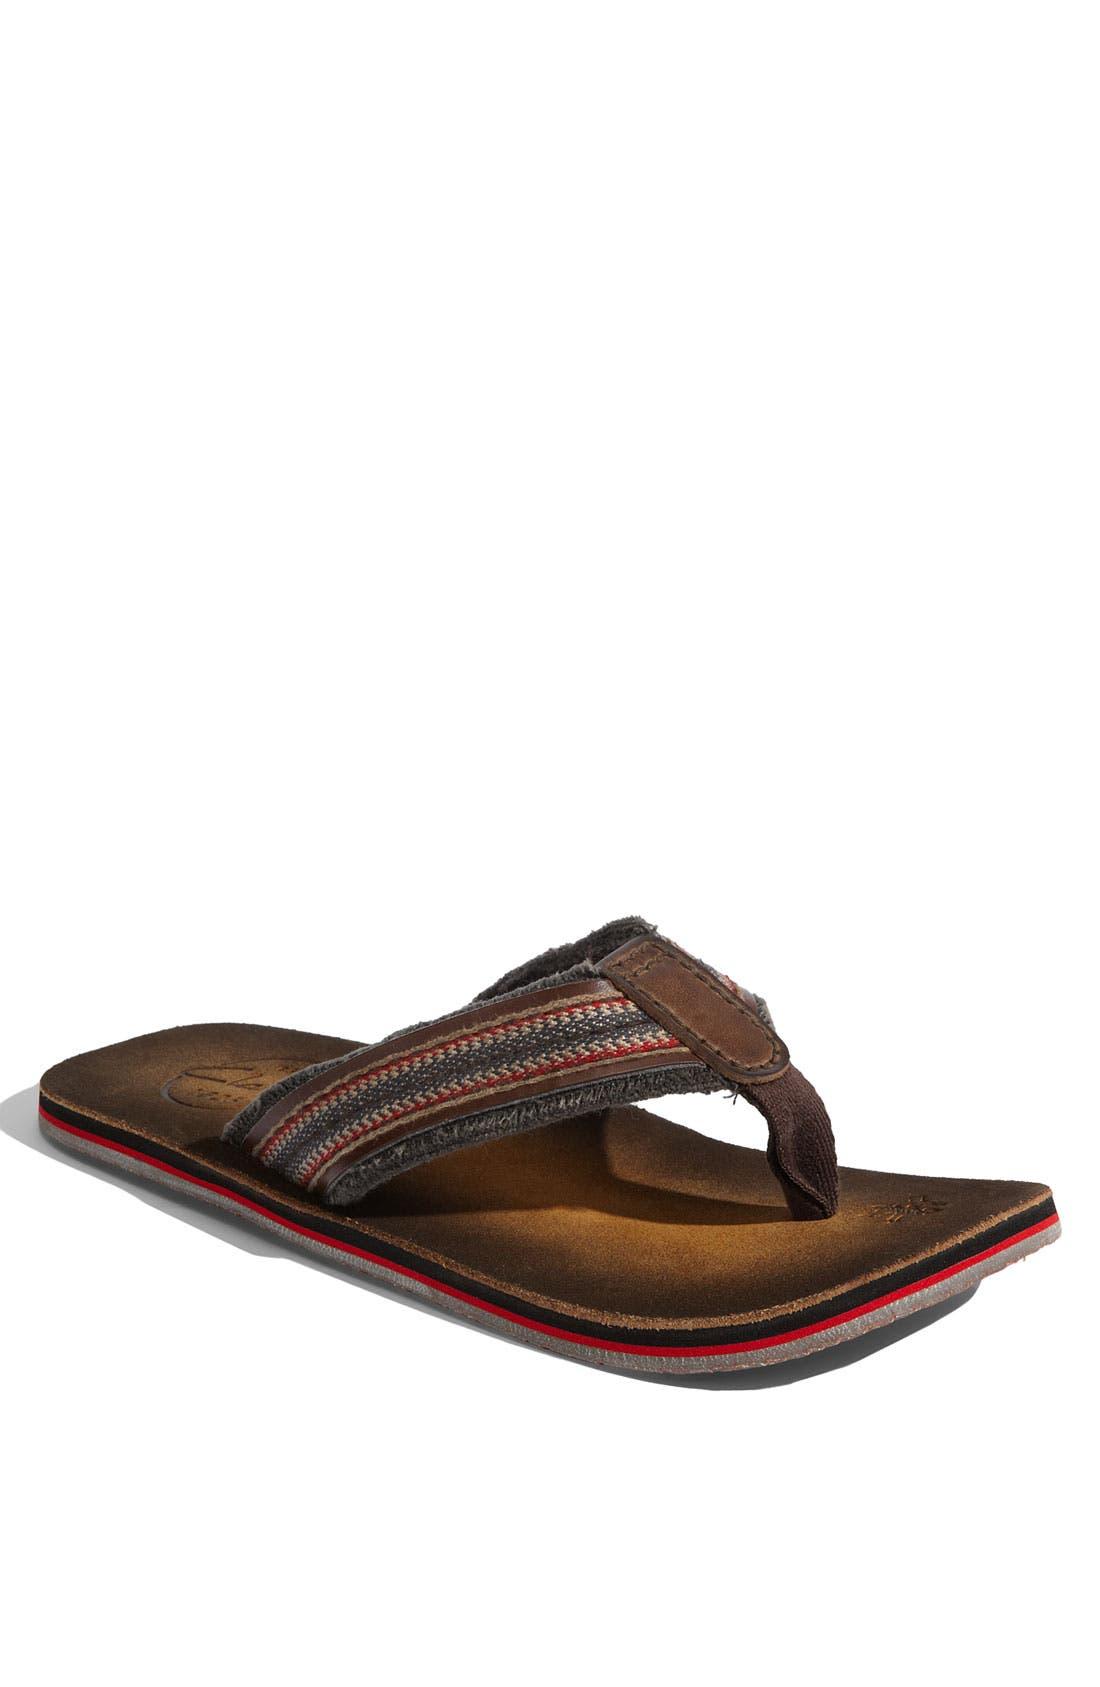 Main Image - Clarks® 'Cayo' Flip Flop